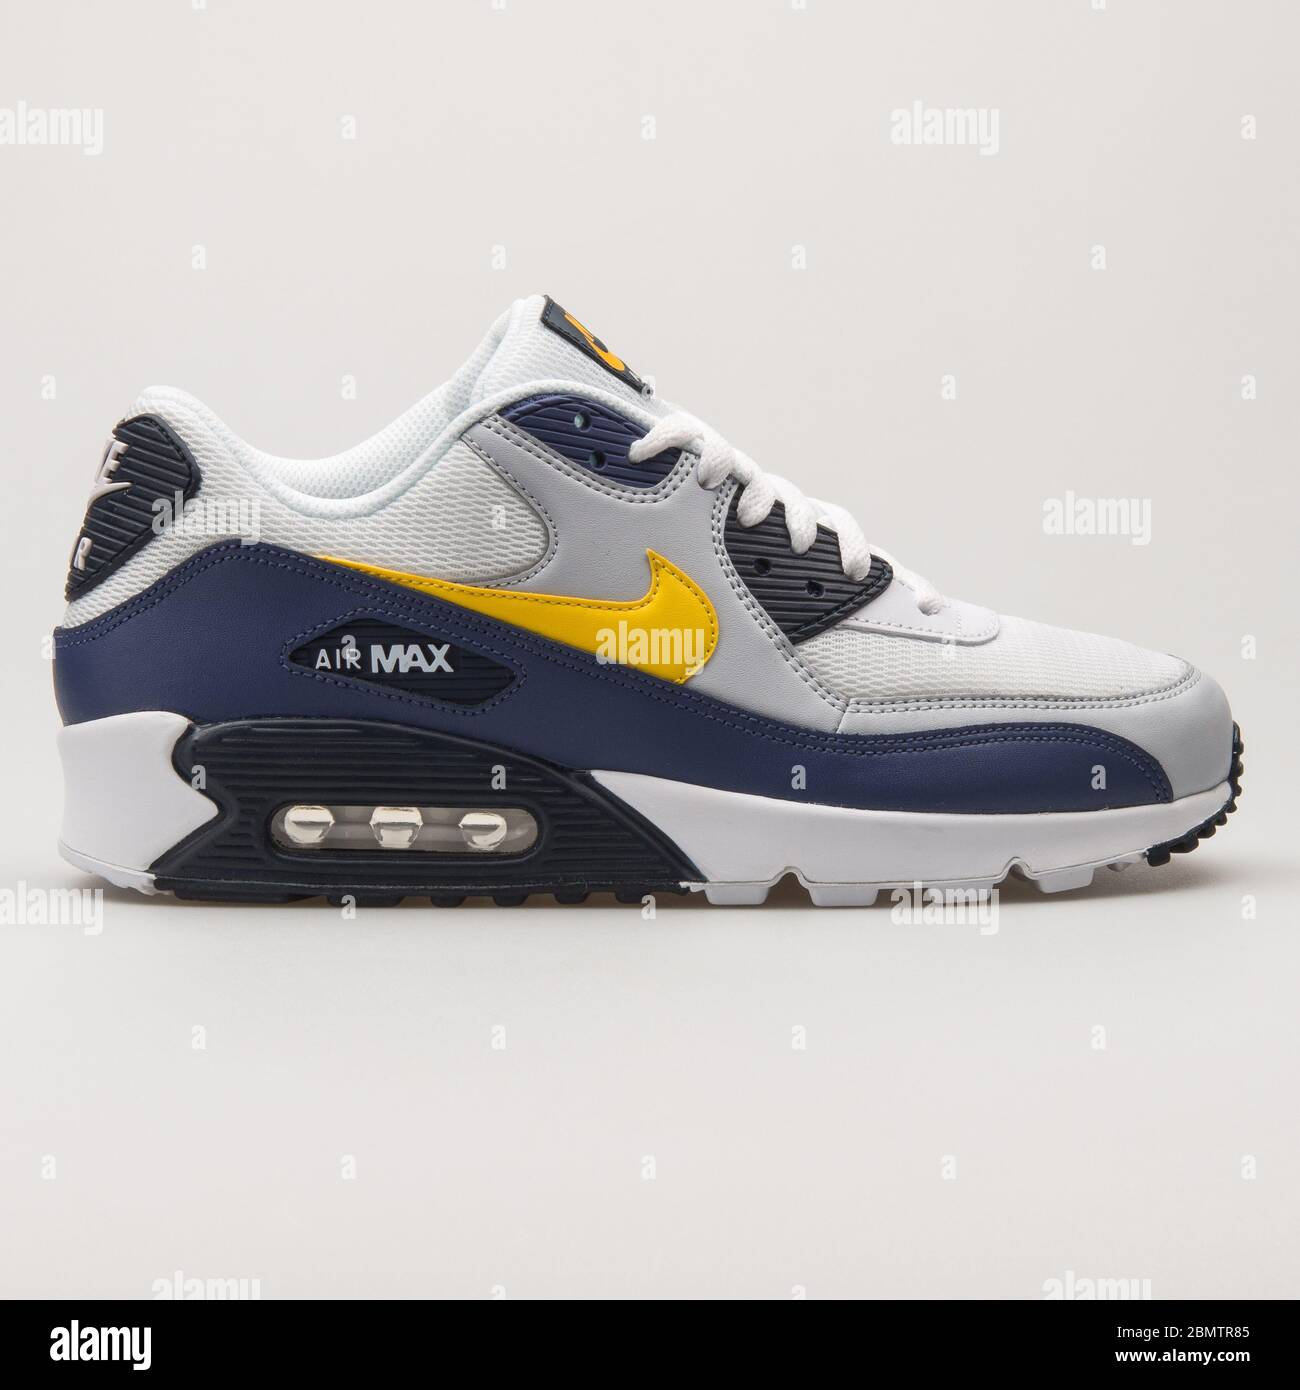 Nike Air Max 90 Essential white, yellow